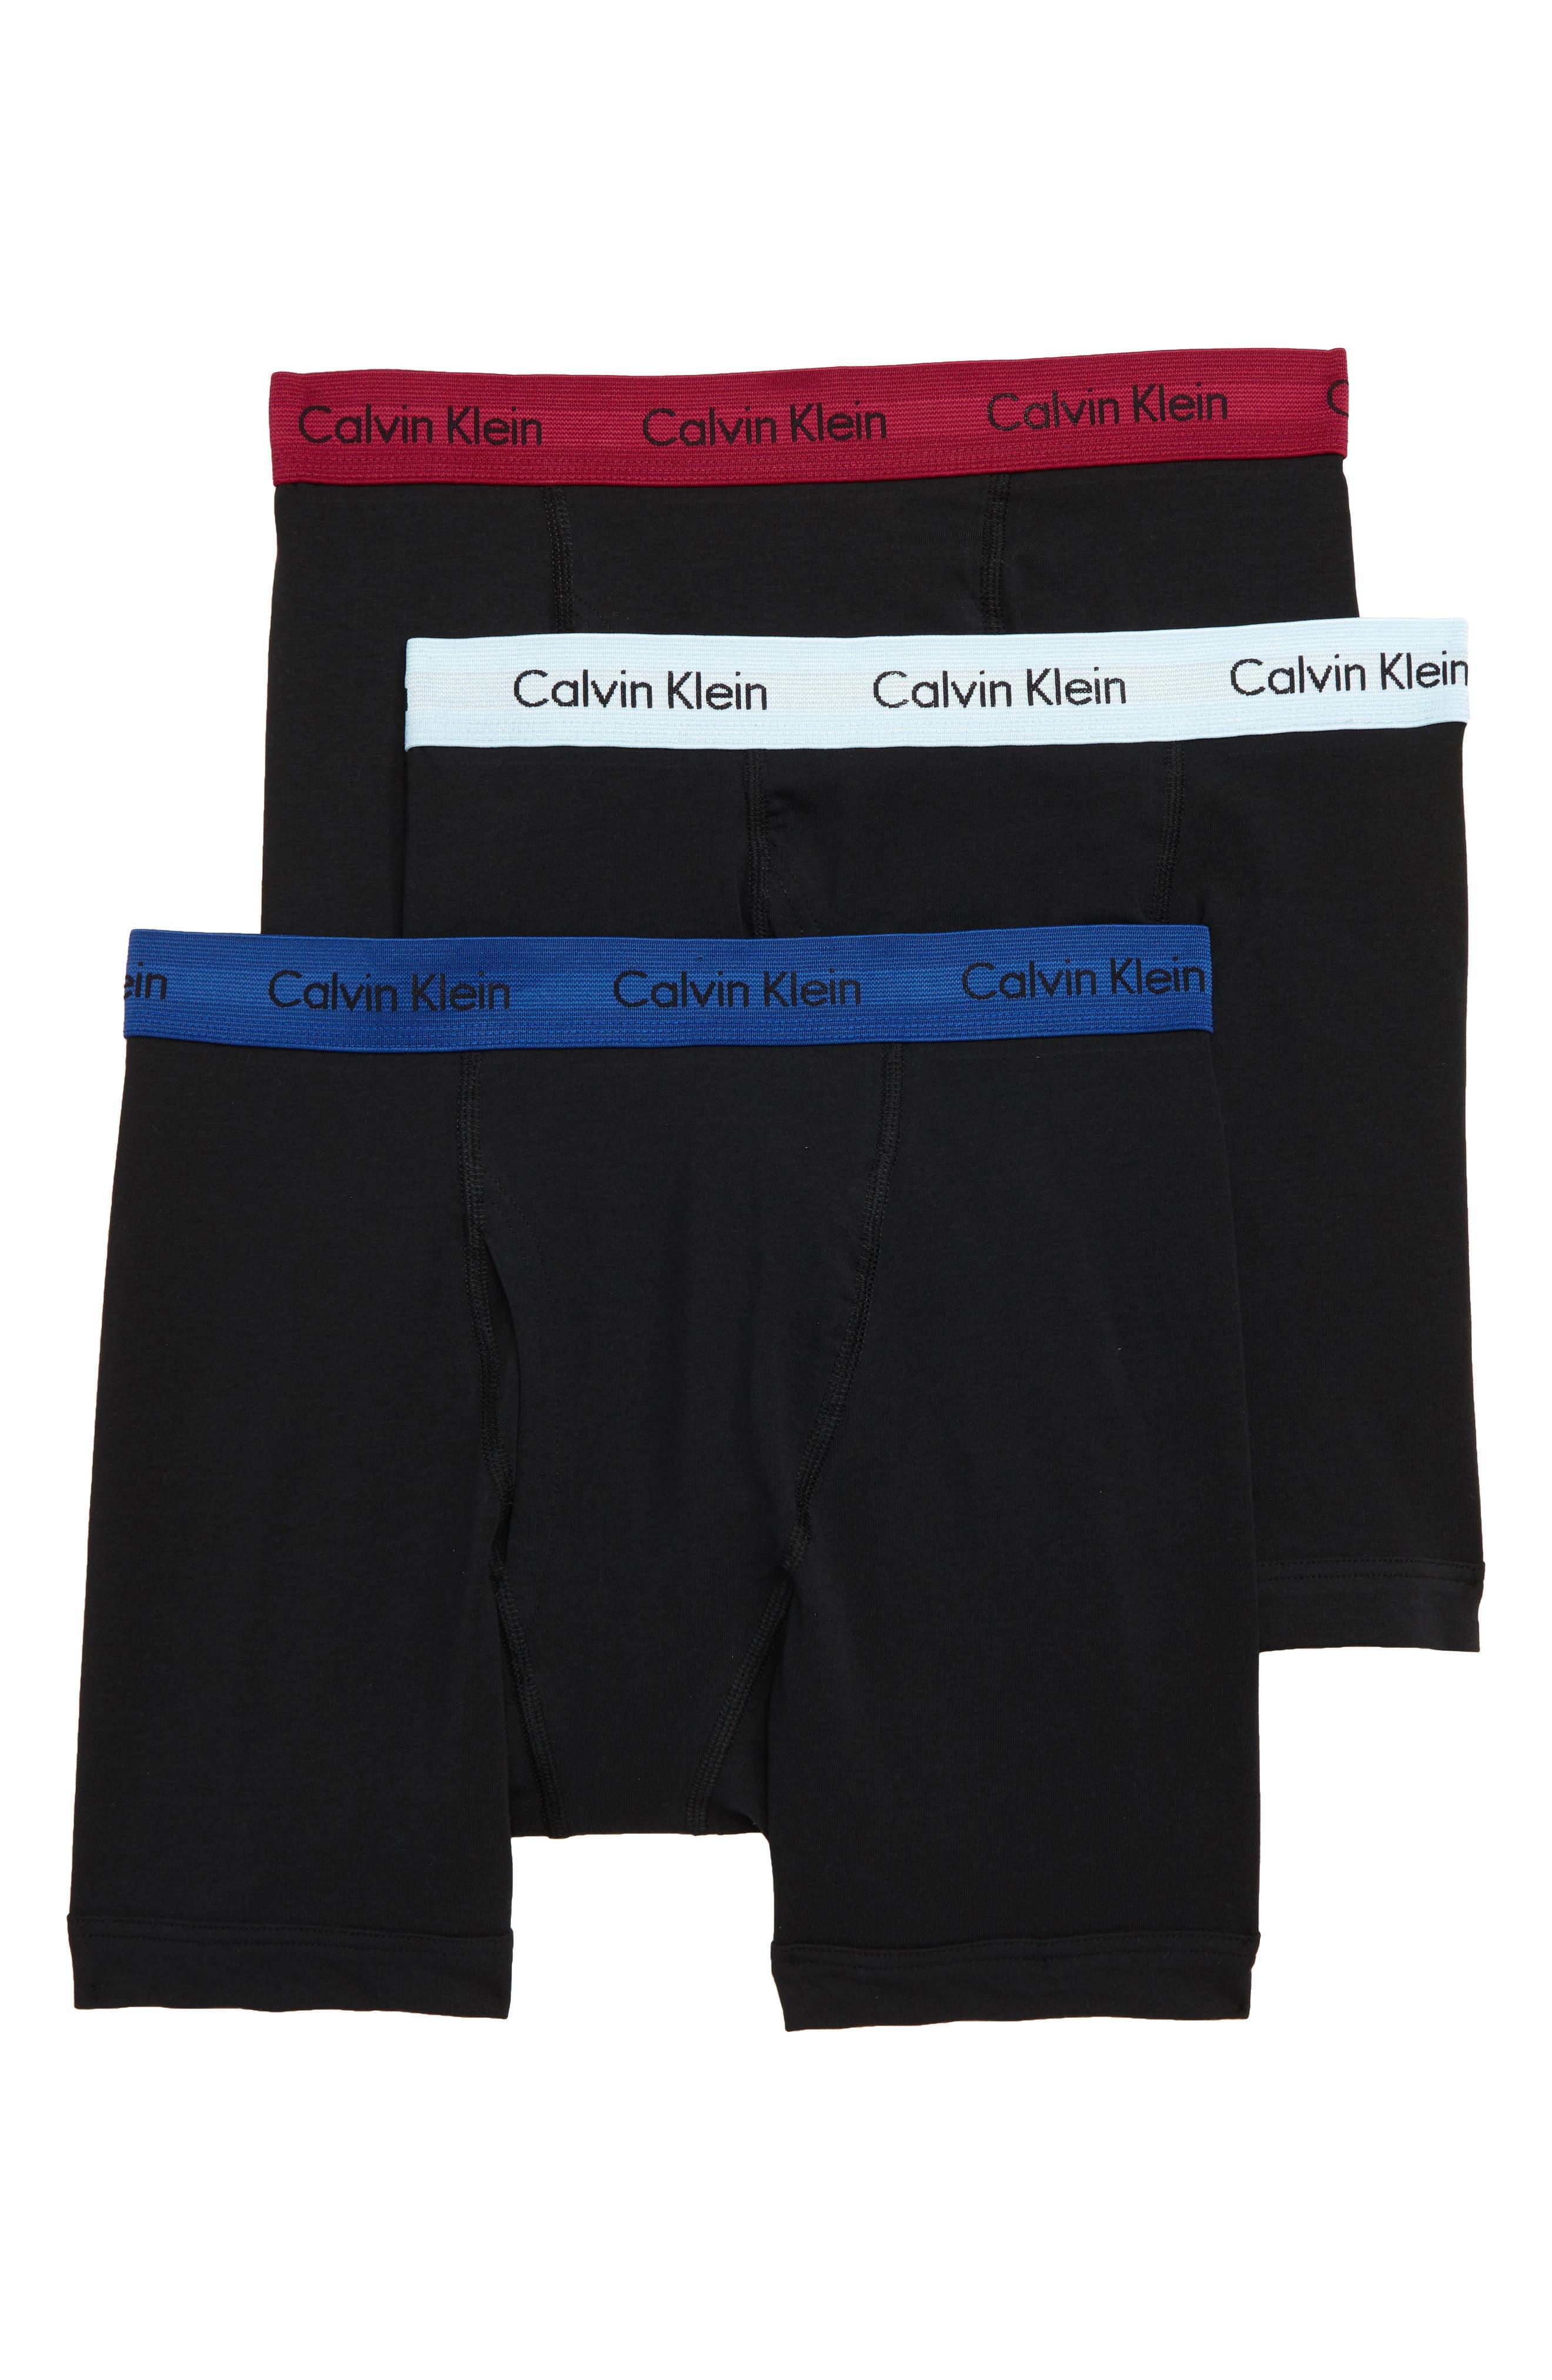 CALVIN KLEIN,                             3-Pack Boxer Briefs,                             Main thumbnail 1, color,                             009